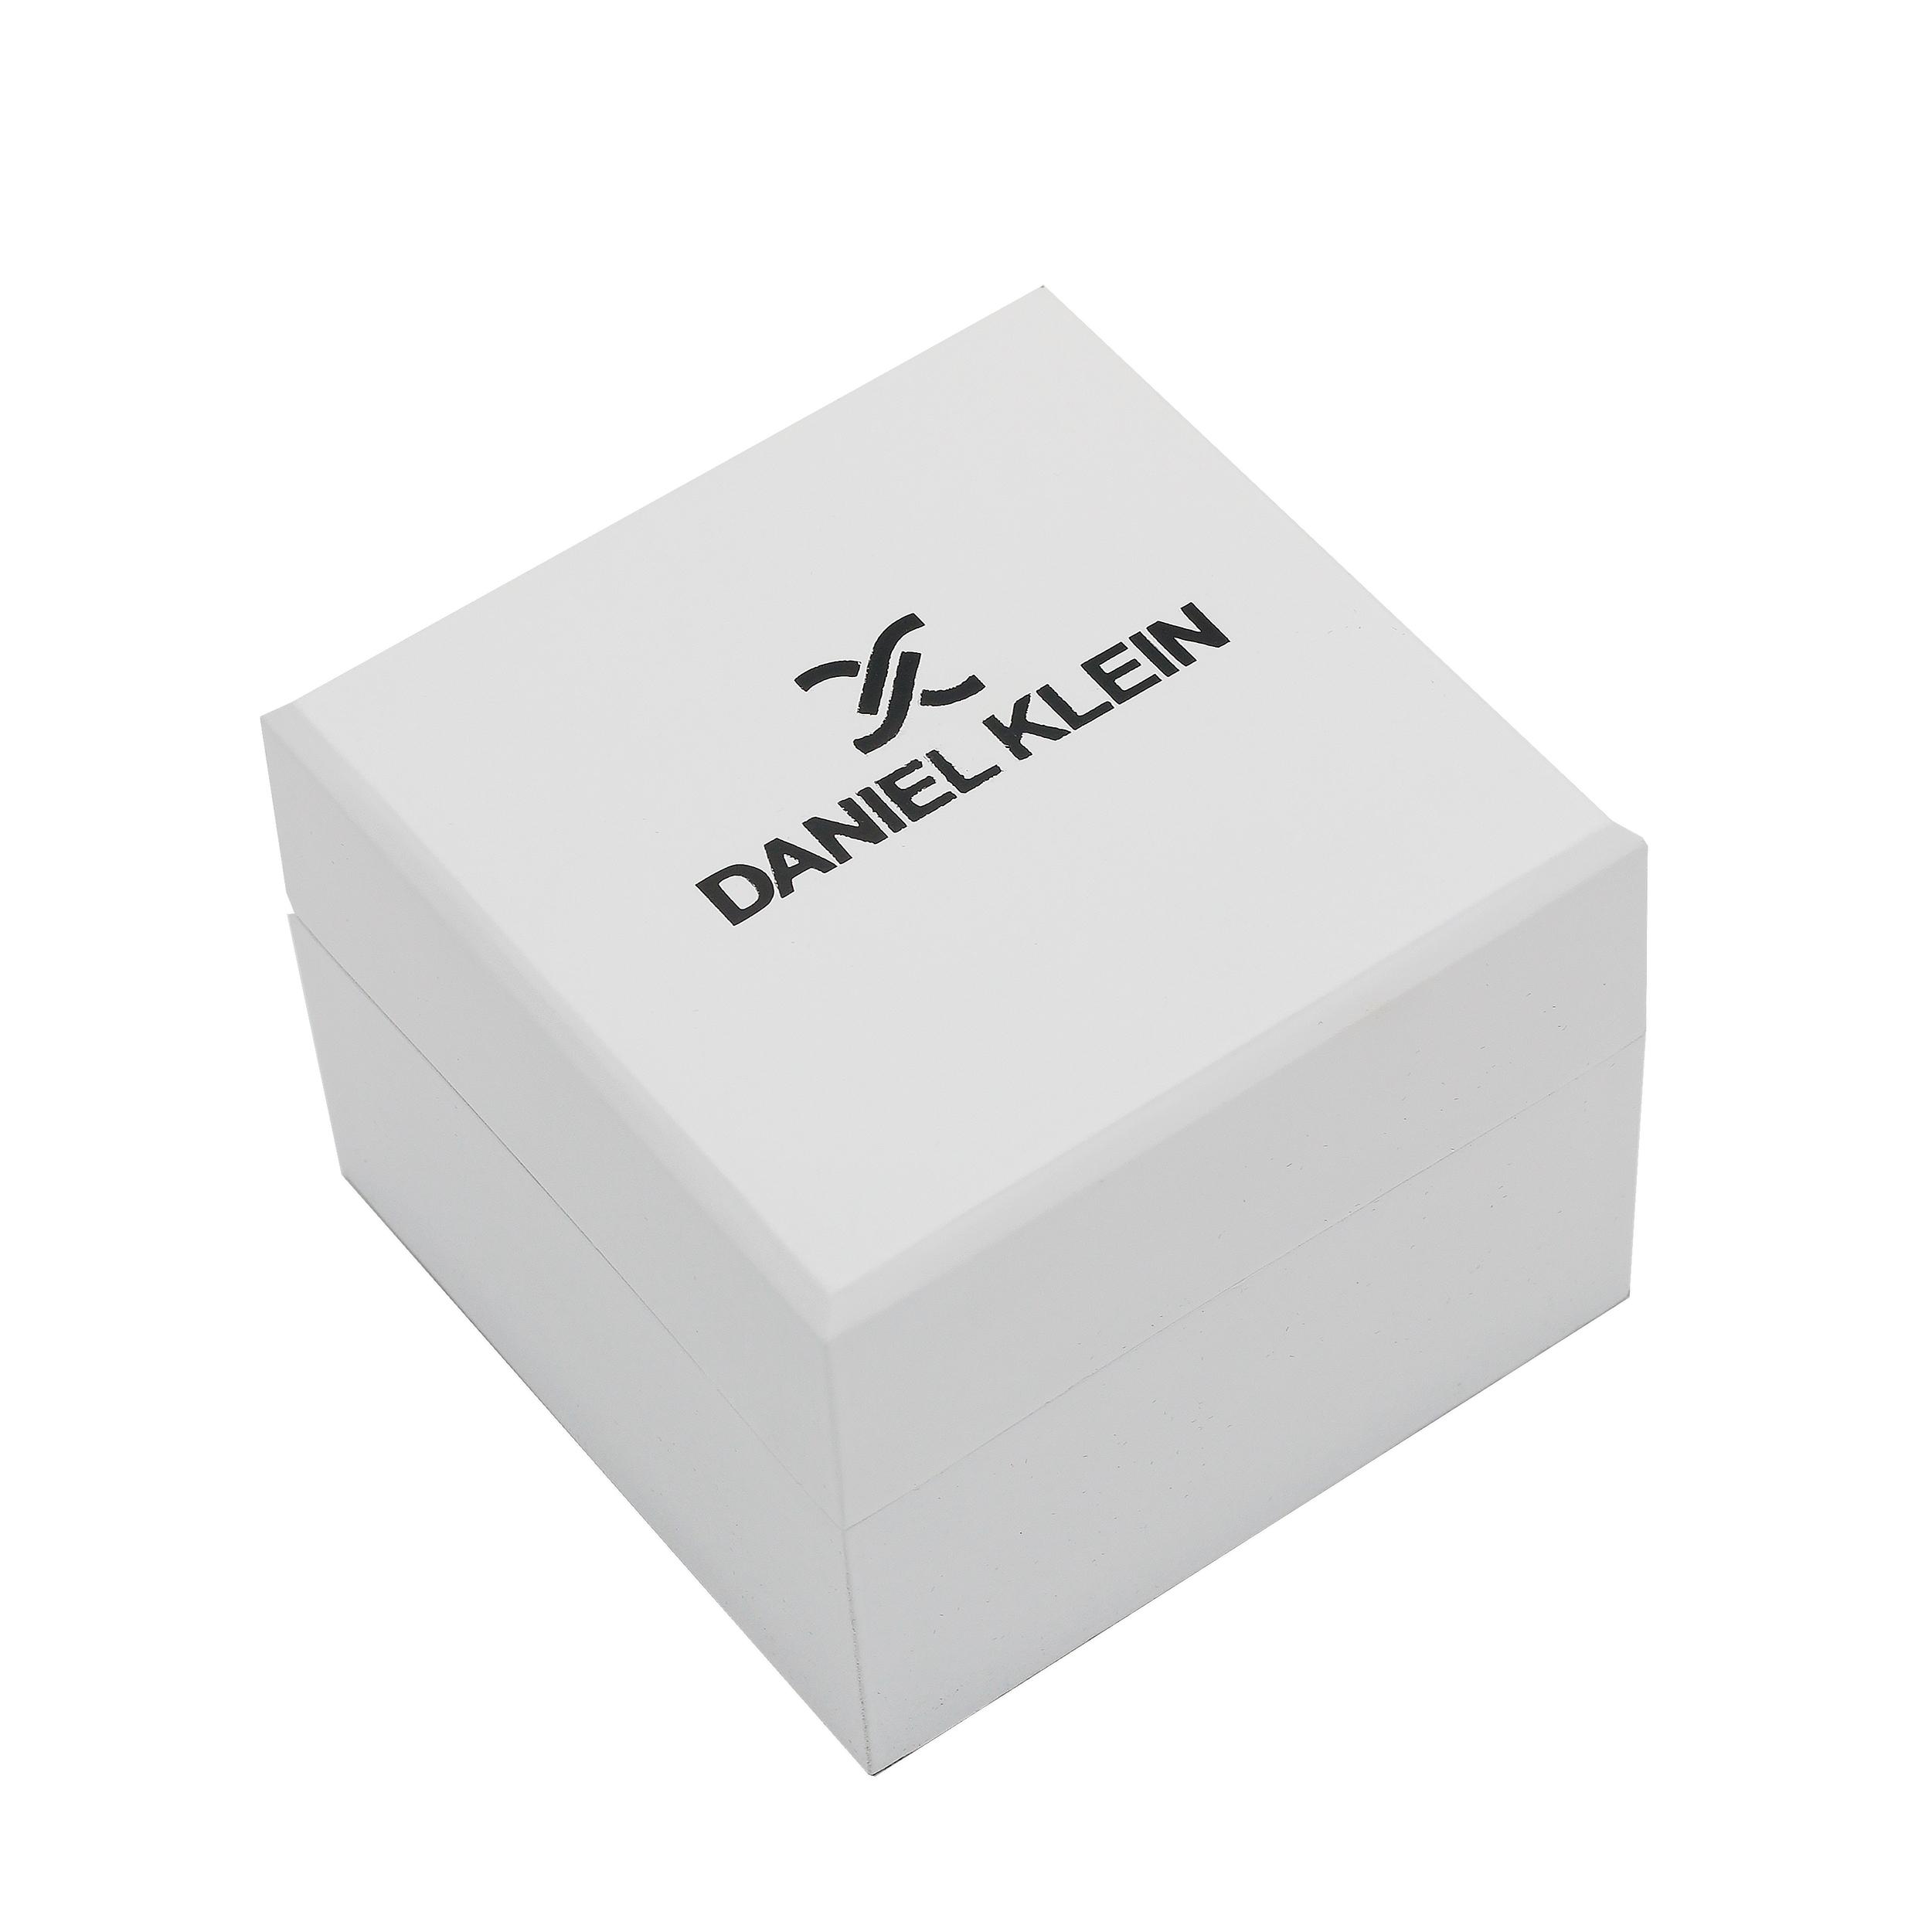 ساعت مچی عقربهای مردانه دنیل کلین مدل DK12603-3